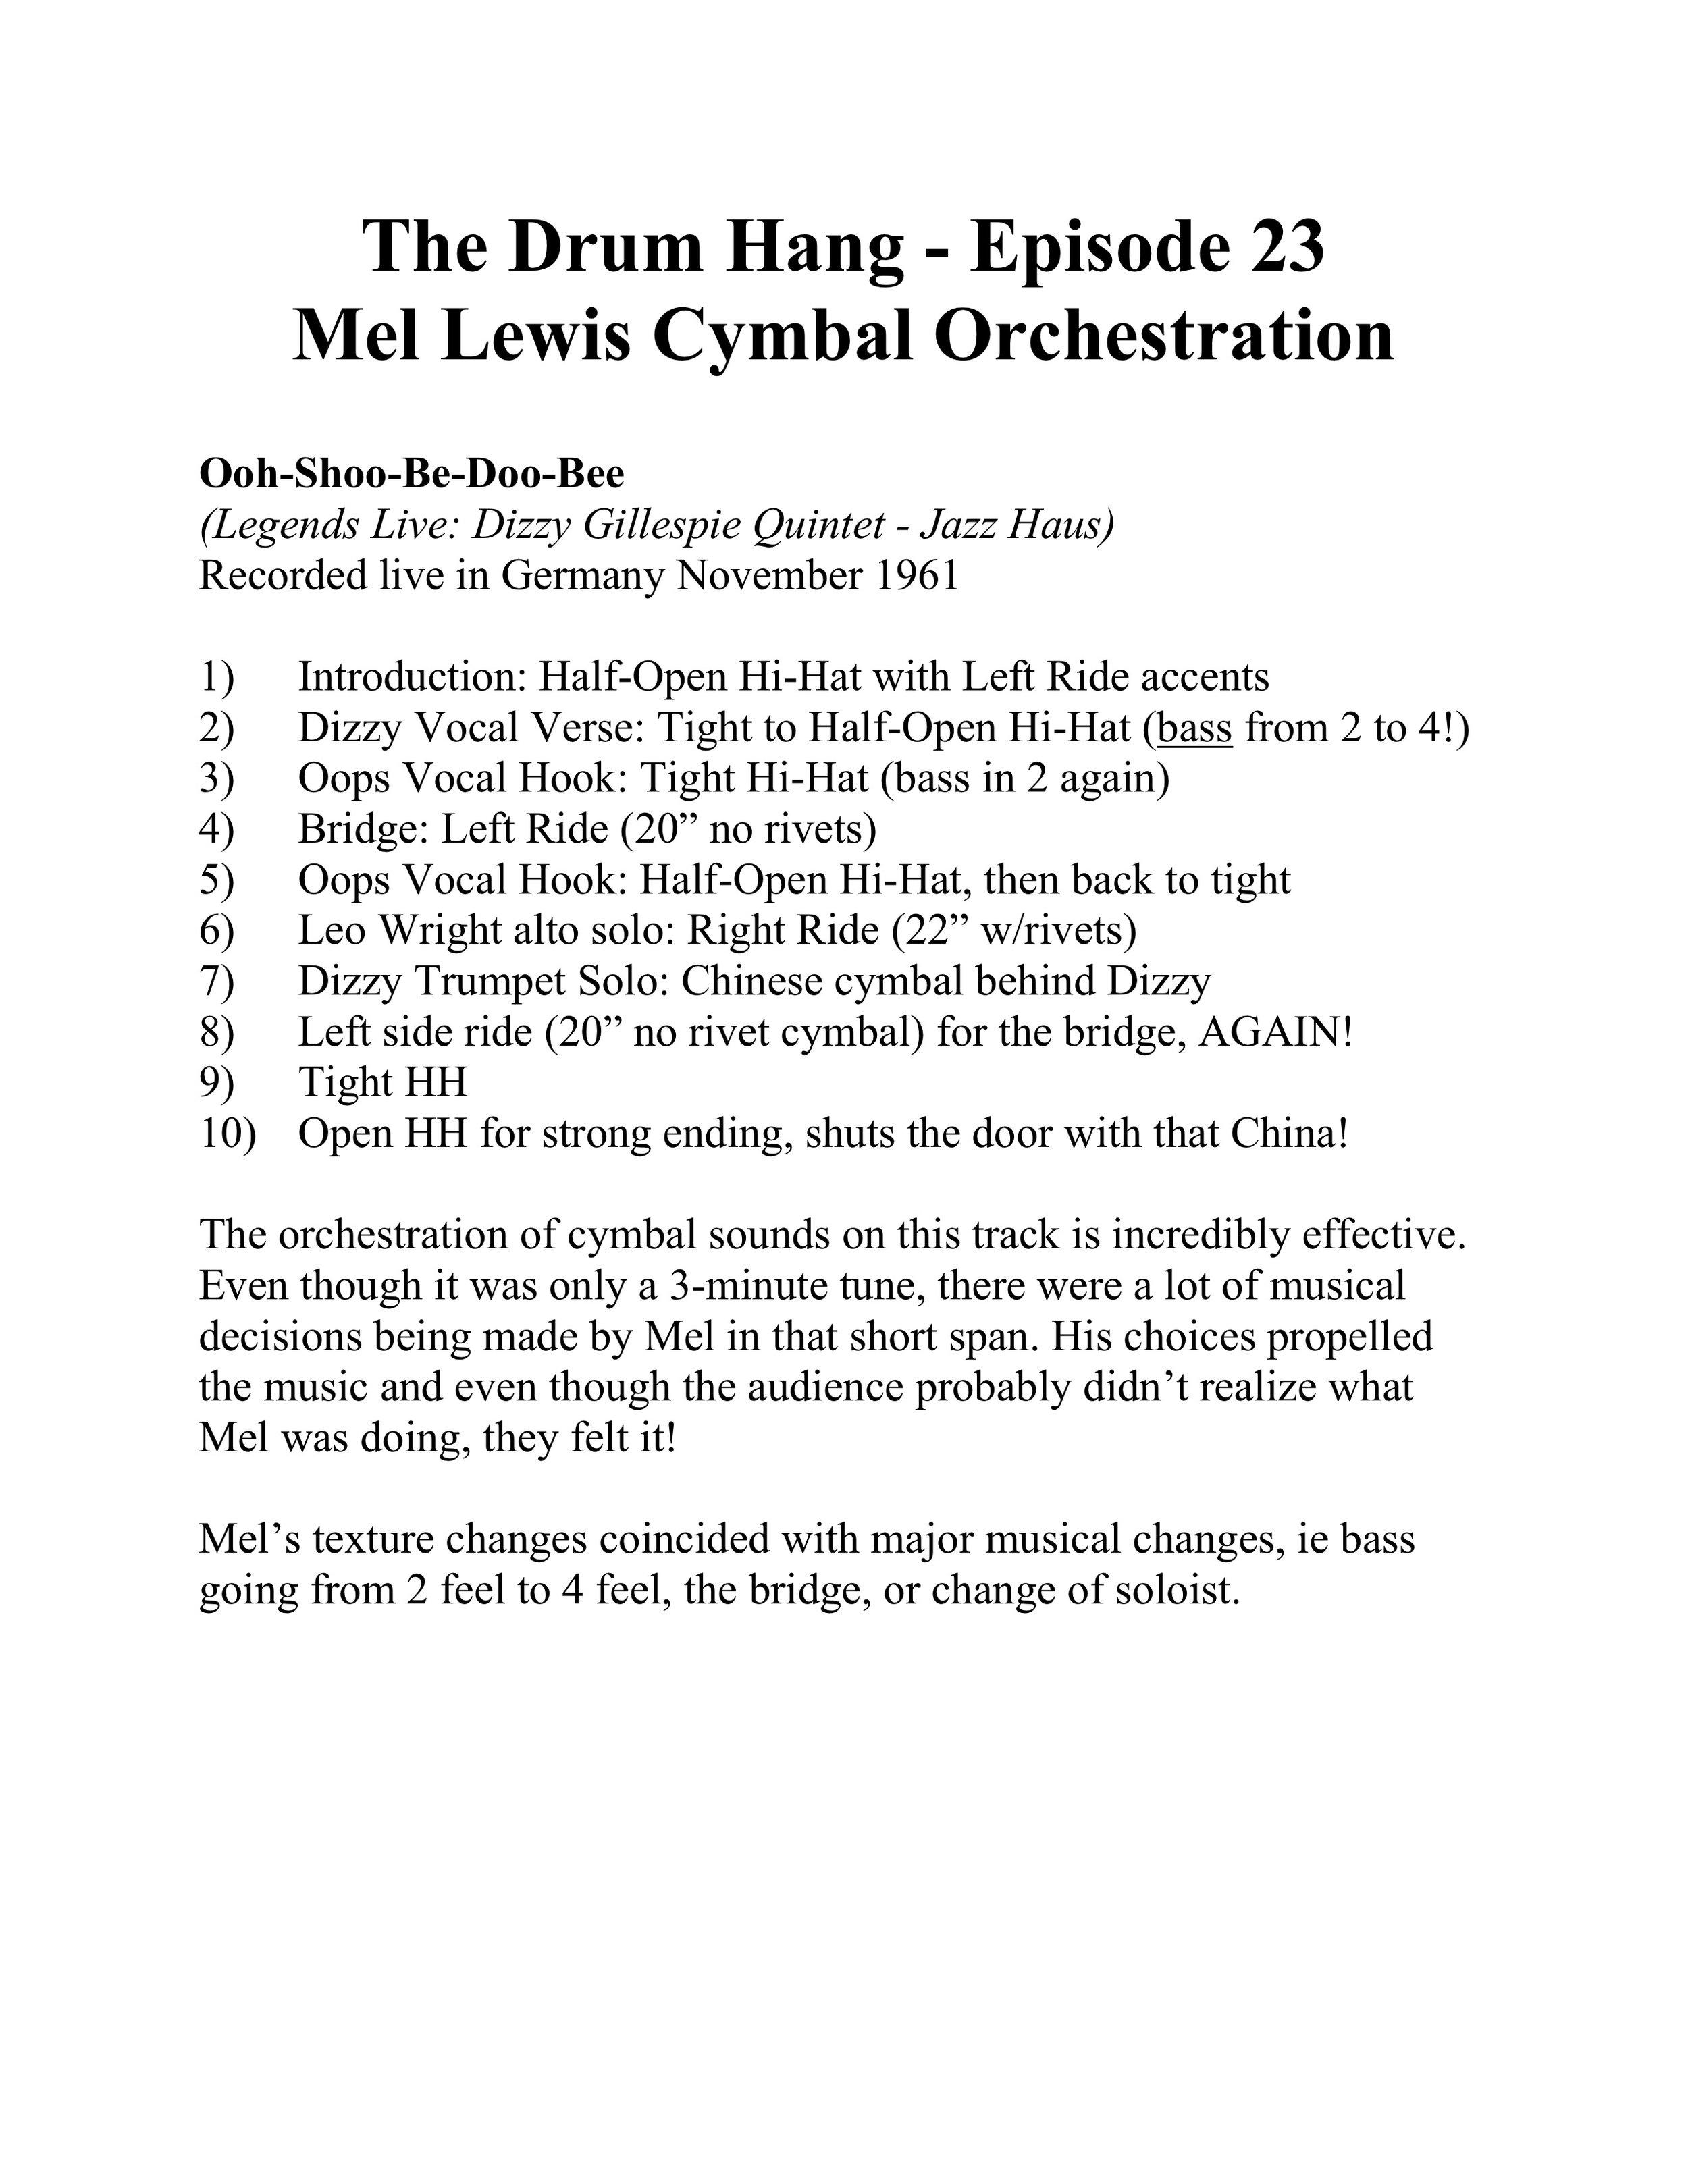 The Drum Hang 23 - Mel Cymbal.jpg